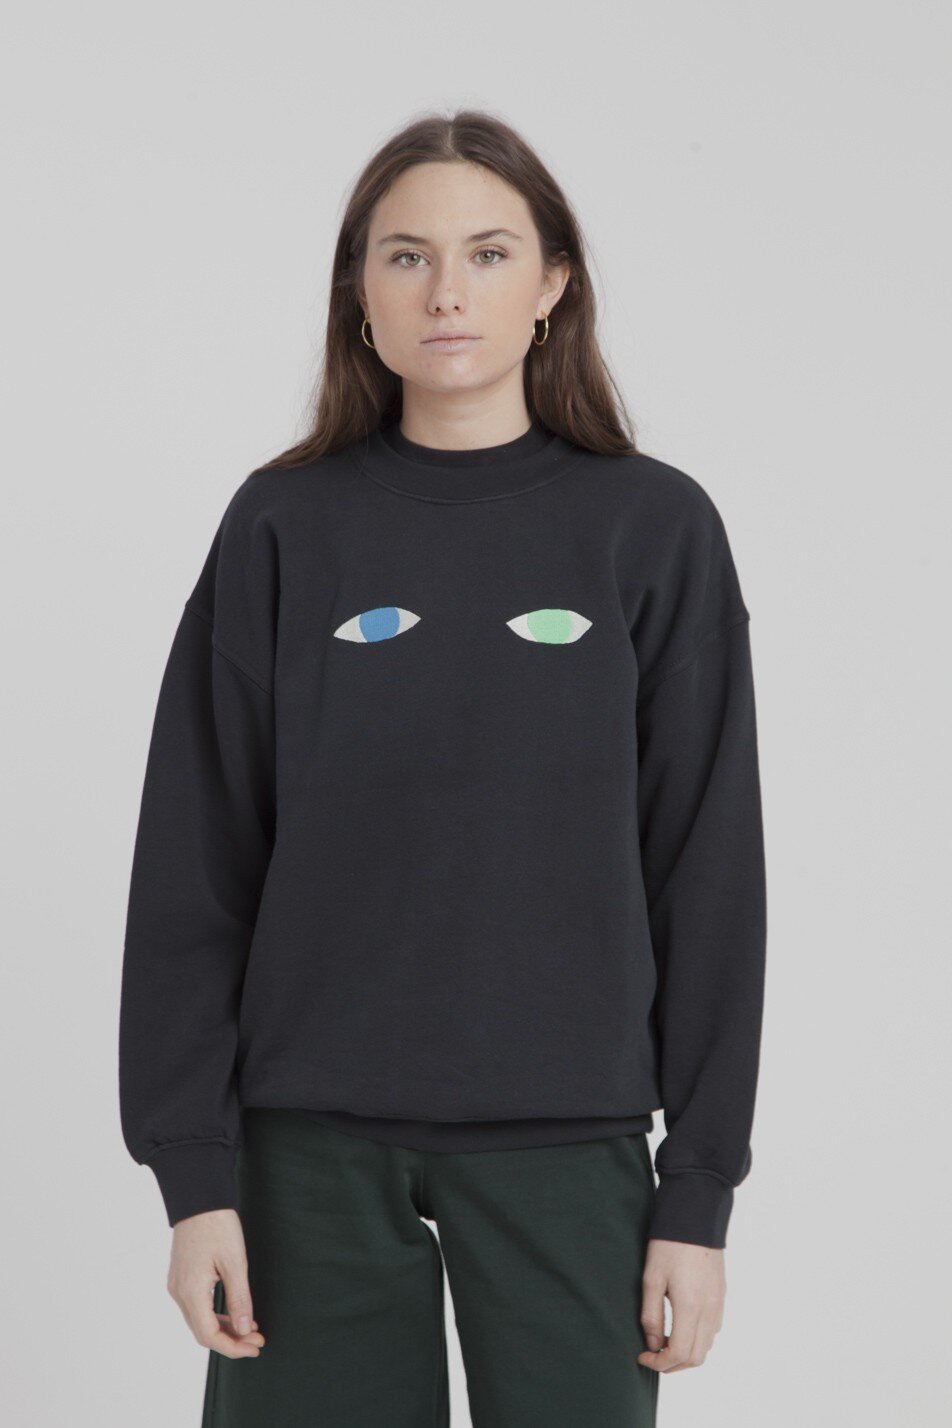 wolf-eyes-sweatshirt.jpg